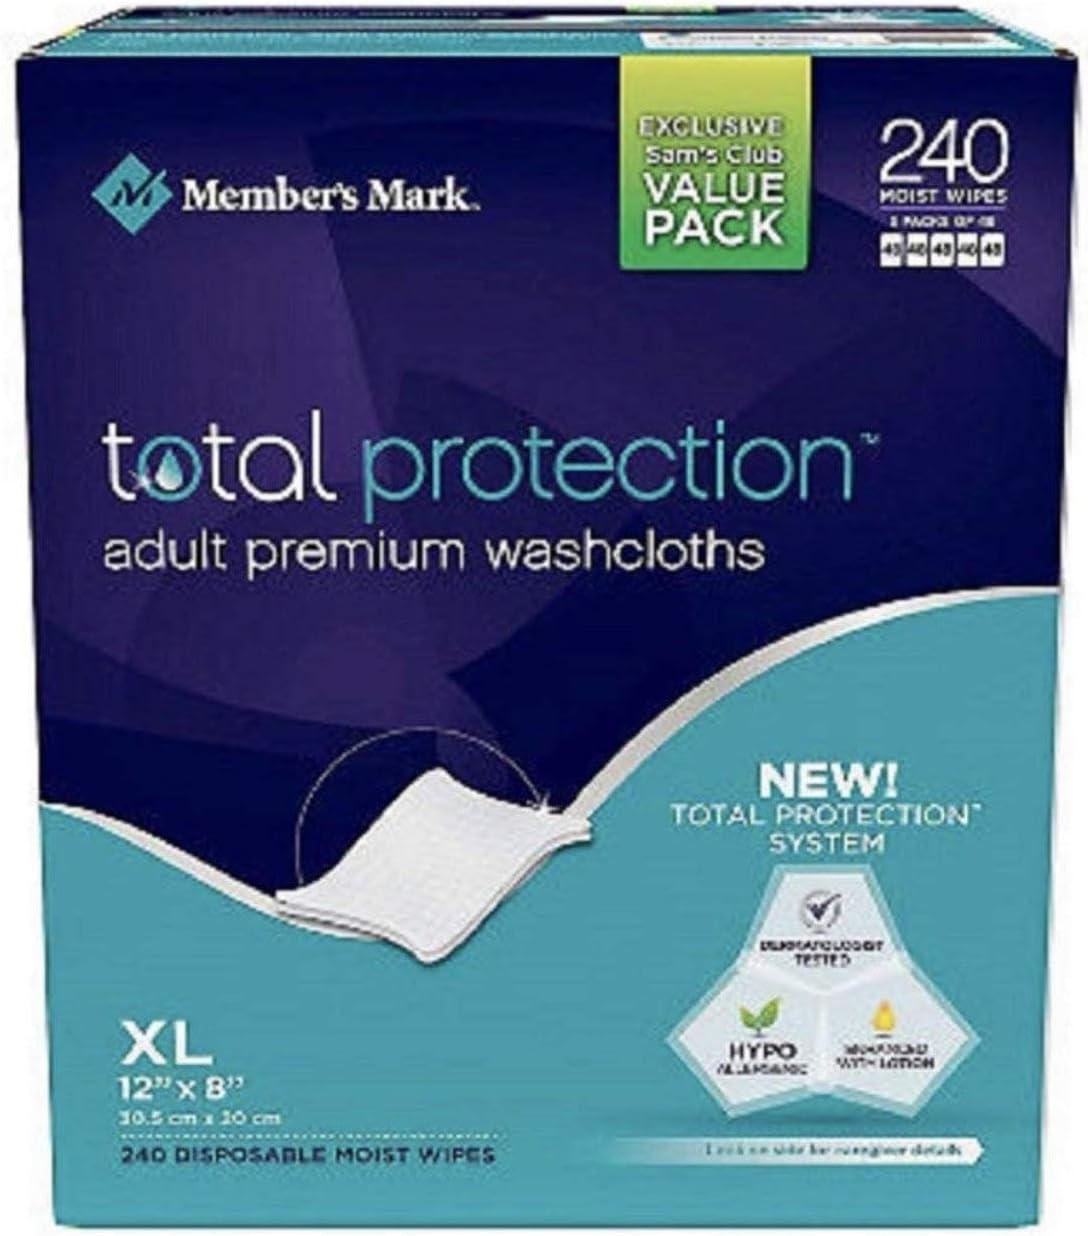 Members Mark total protection